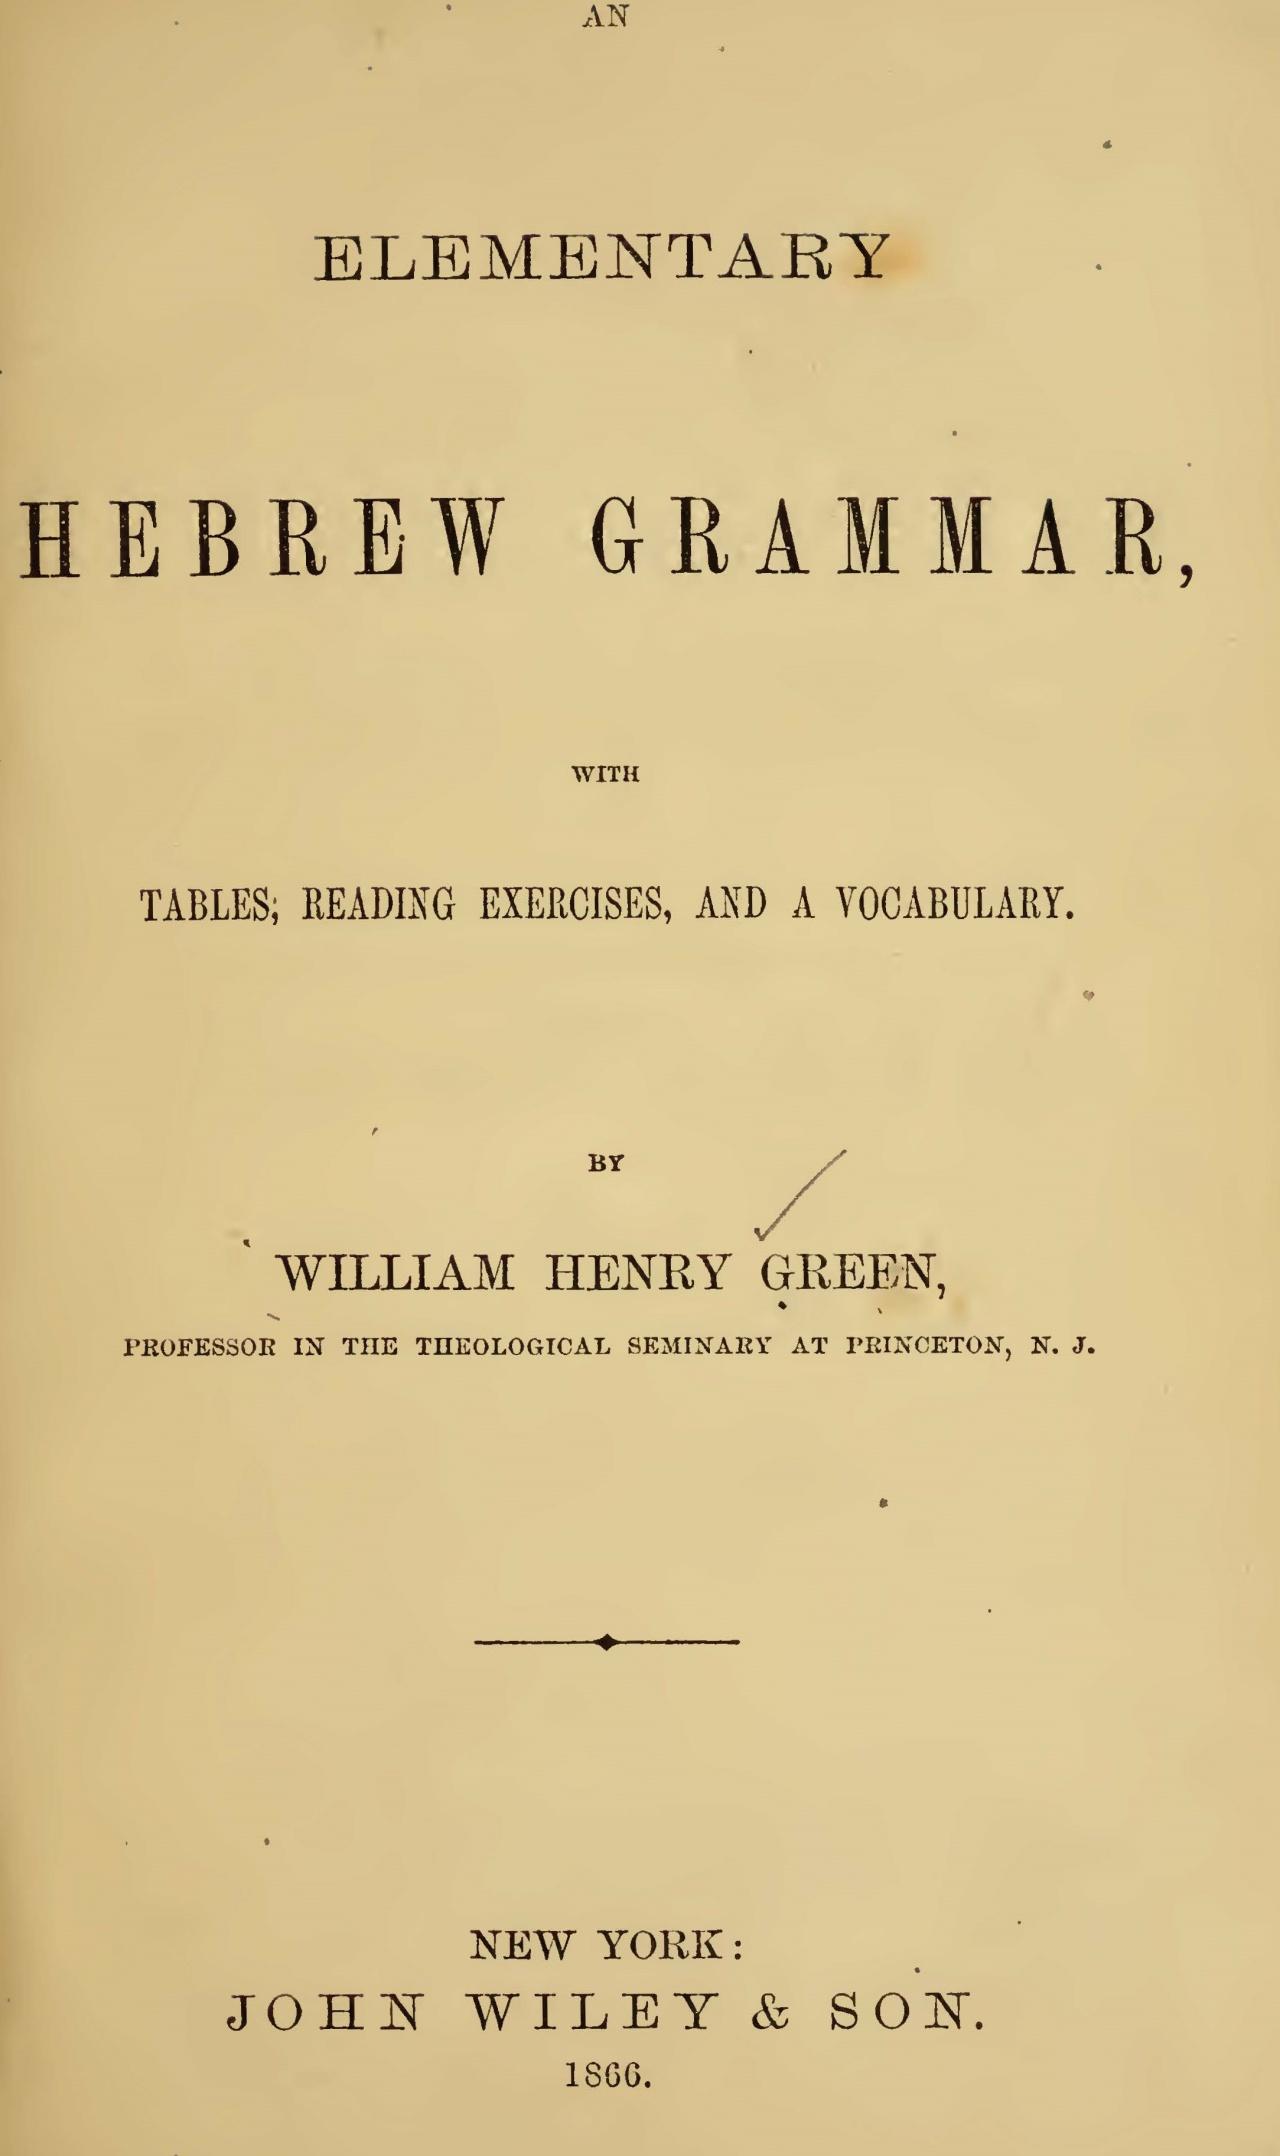 Green, William Henry, An Elementary Hebrew Grammar Title Page.jpg